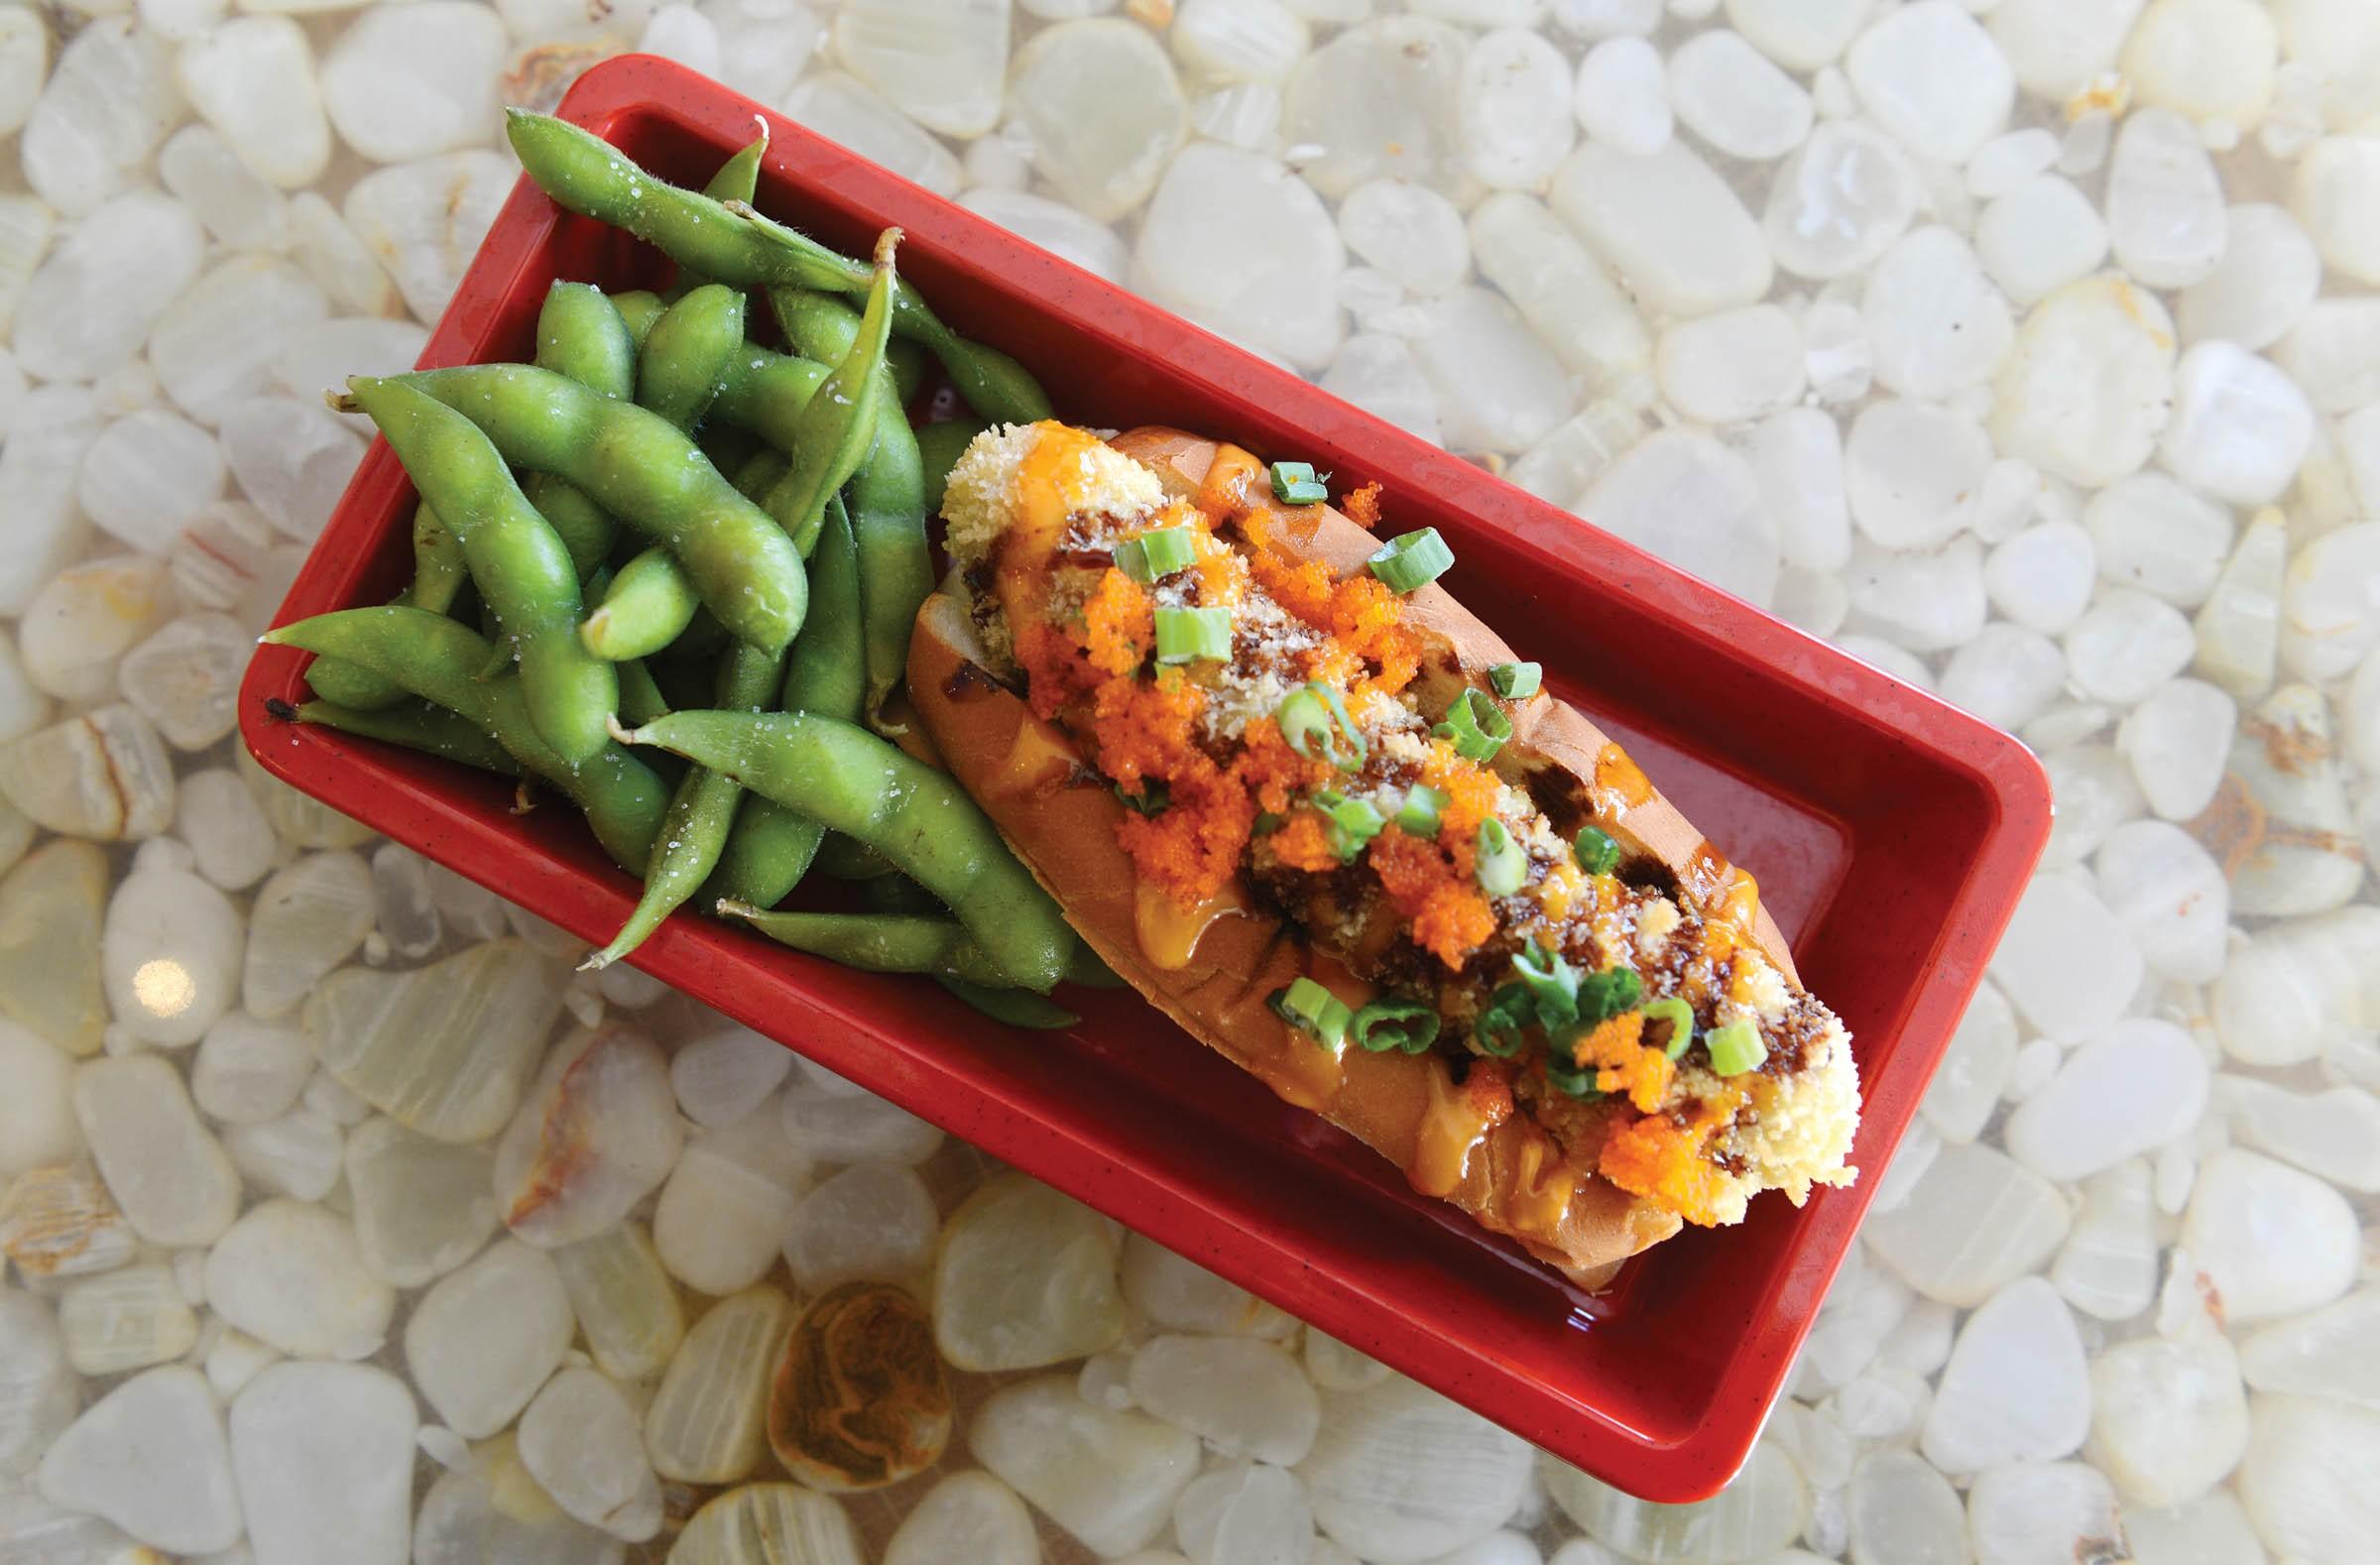 At A2 downtown, the signature bento dog is crispy tempura with Japanese mayo, nori flakes and teriyaki sauce. - SCOTT ELMQUIST